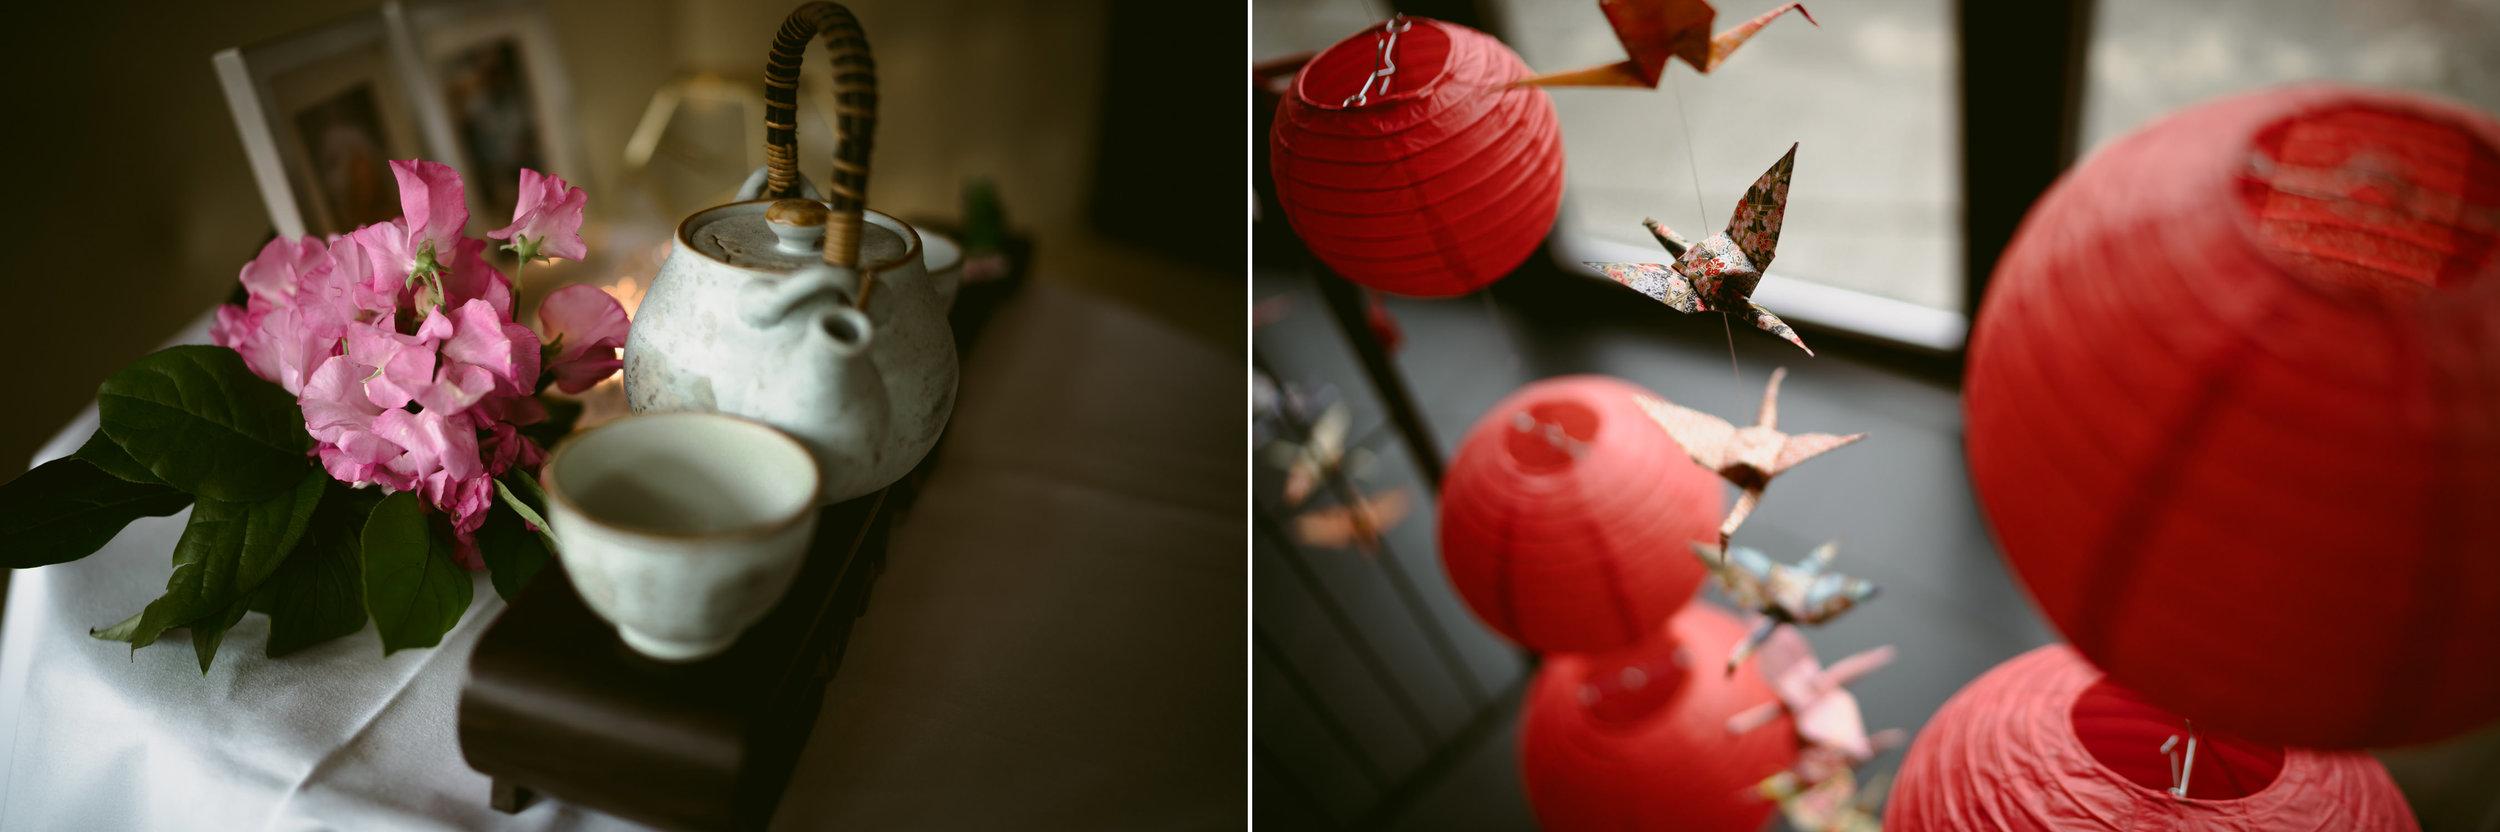 bruidsfotografie-amsterdam-utrecht-trouwfotograaf-mark-hadden-wedding-photography-Robin & Guus-153 copy.jpg